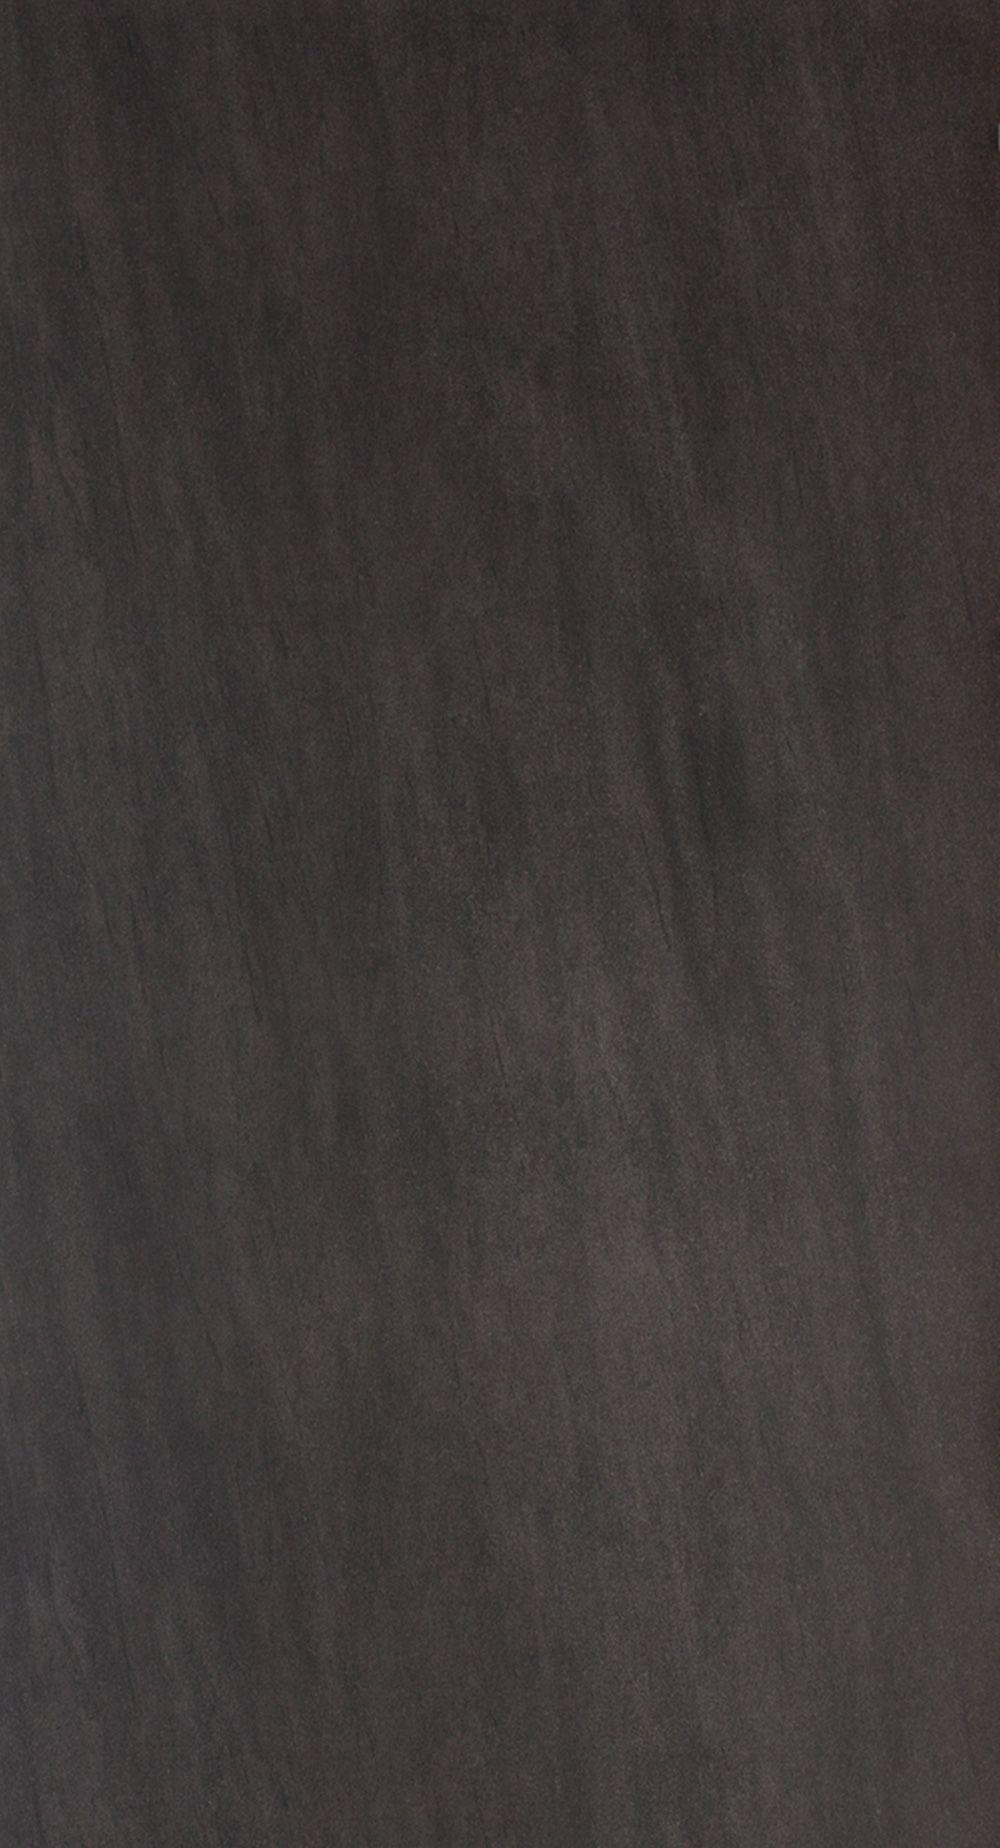 Basalt Black Neolith Countertop Countertops Pros And Cons Cost Rock  Countertopsbasalt Stone #14624   Kitchen